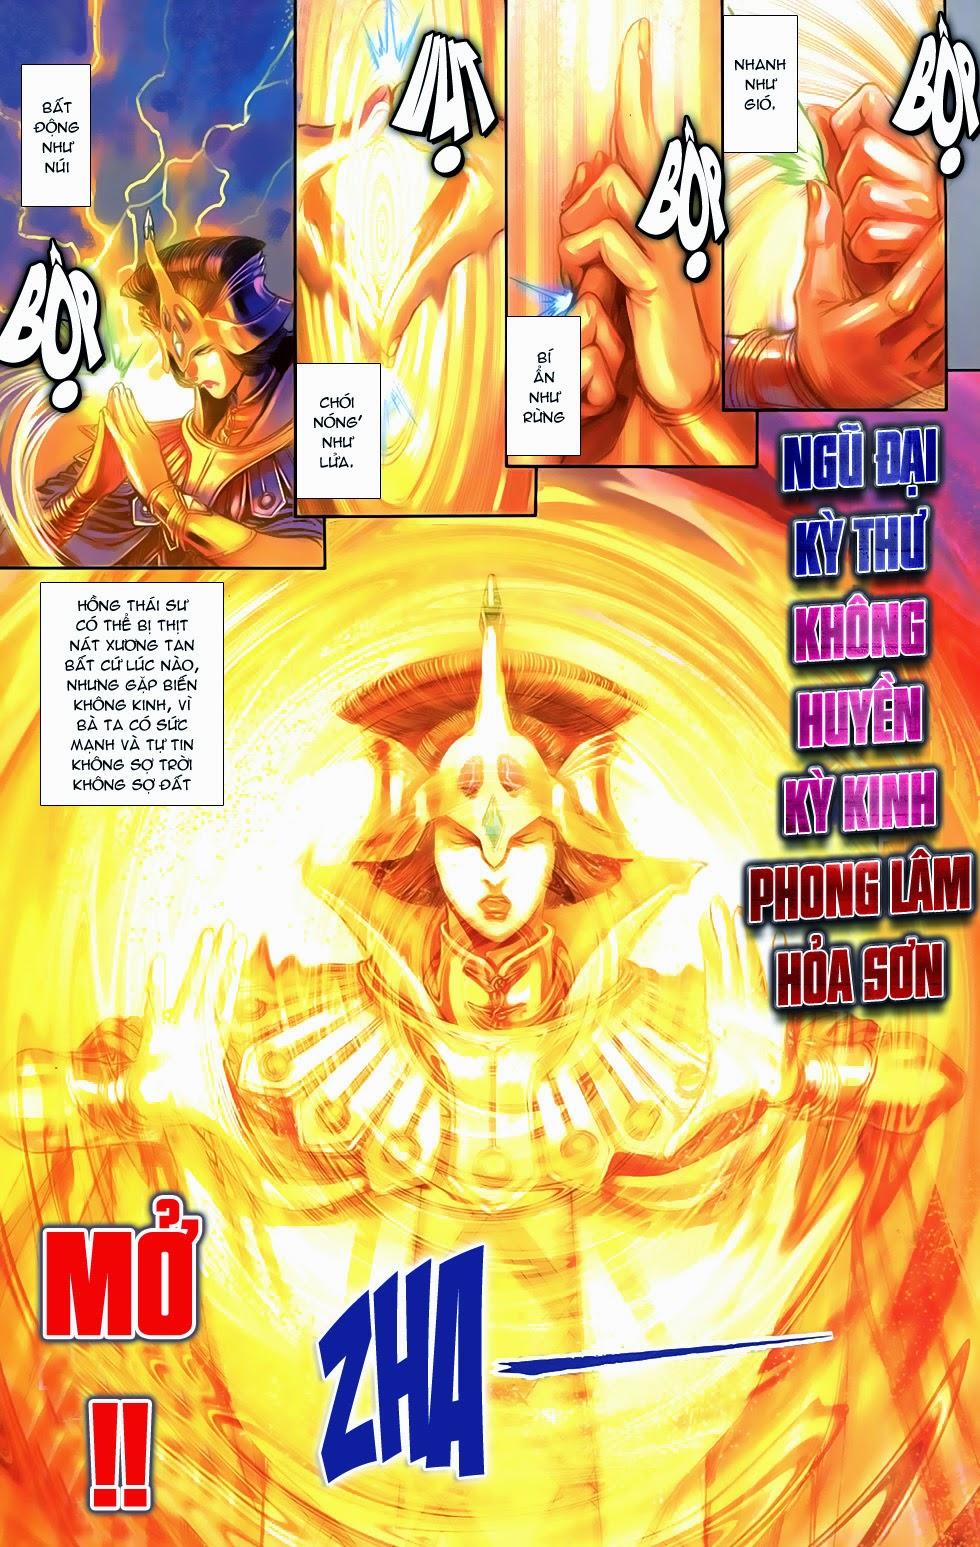 108 - Tân Thuỷ Hử  Chap 006 - Truyenmoi.xyz